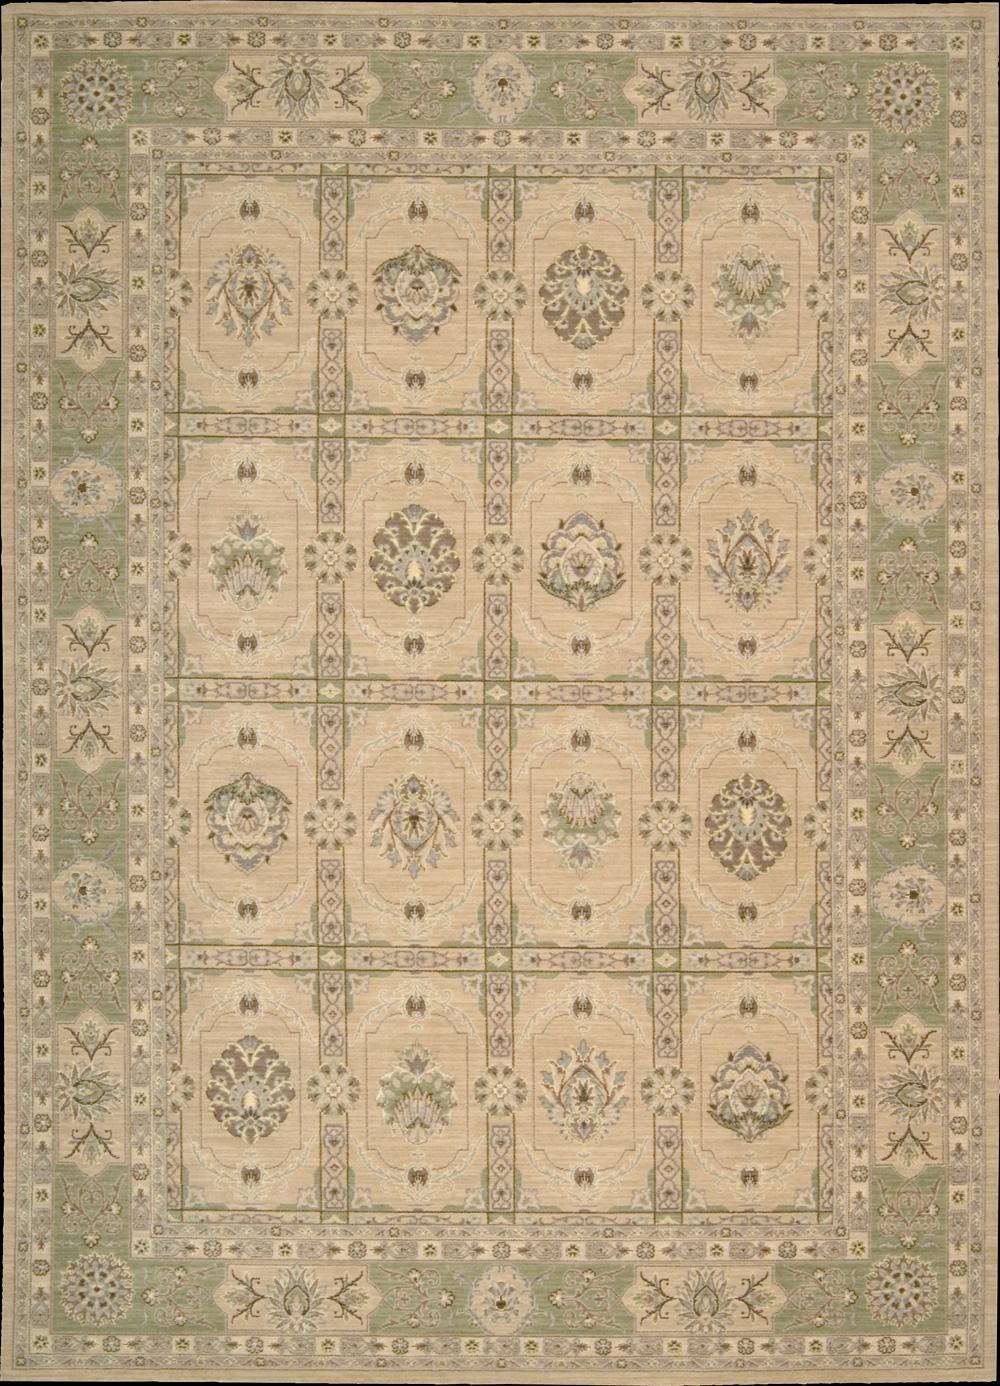 "Nourison Persian Empire Area Rug 5'3"" x 7'5"" - Item Number: 25464"